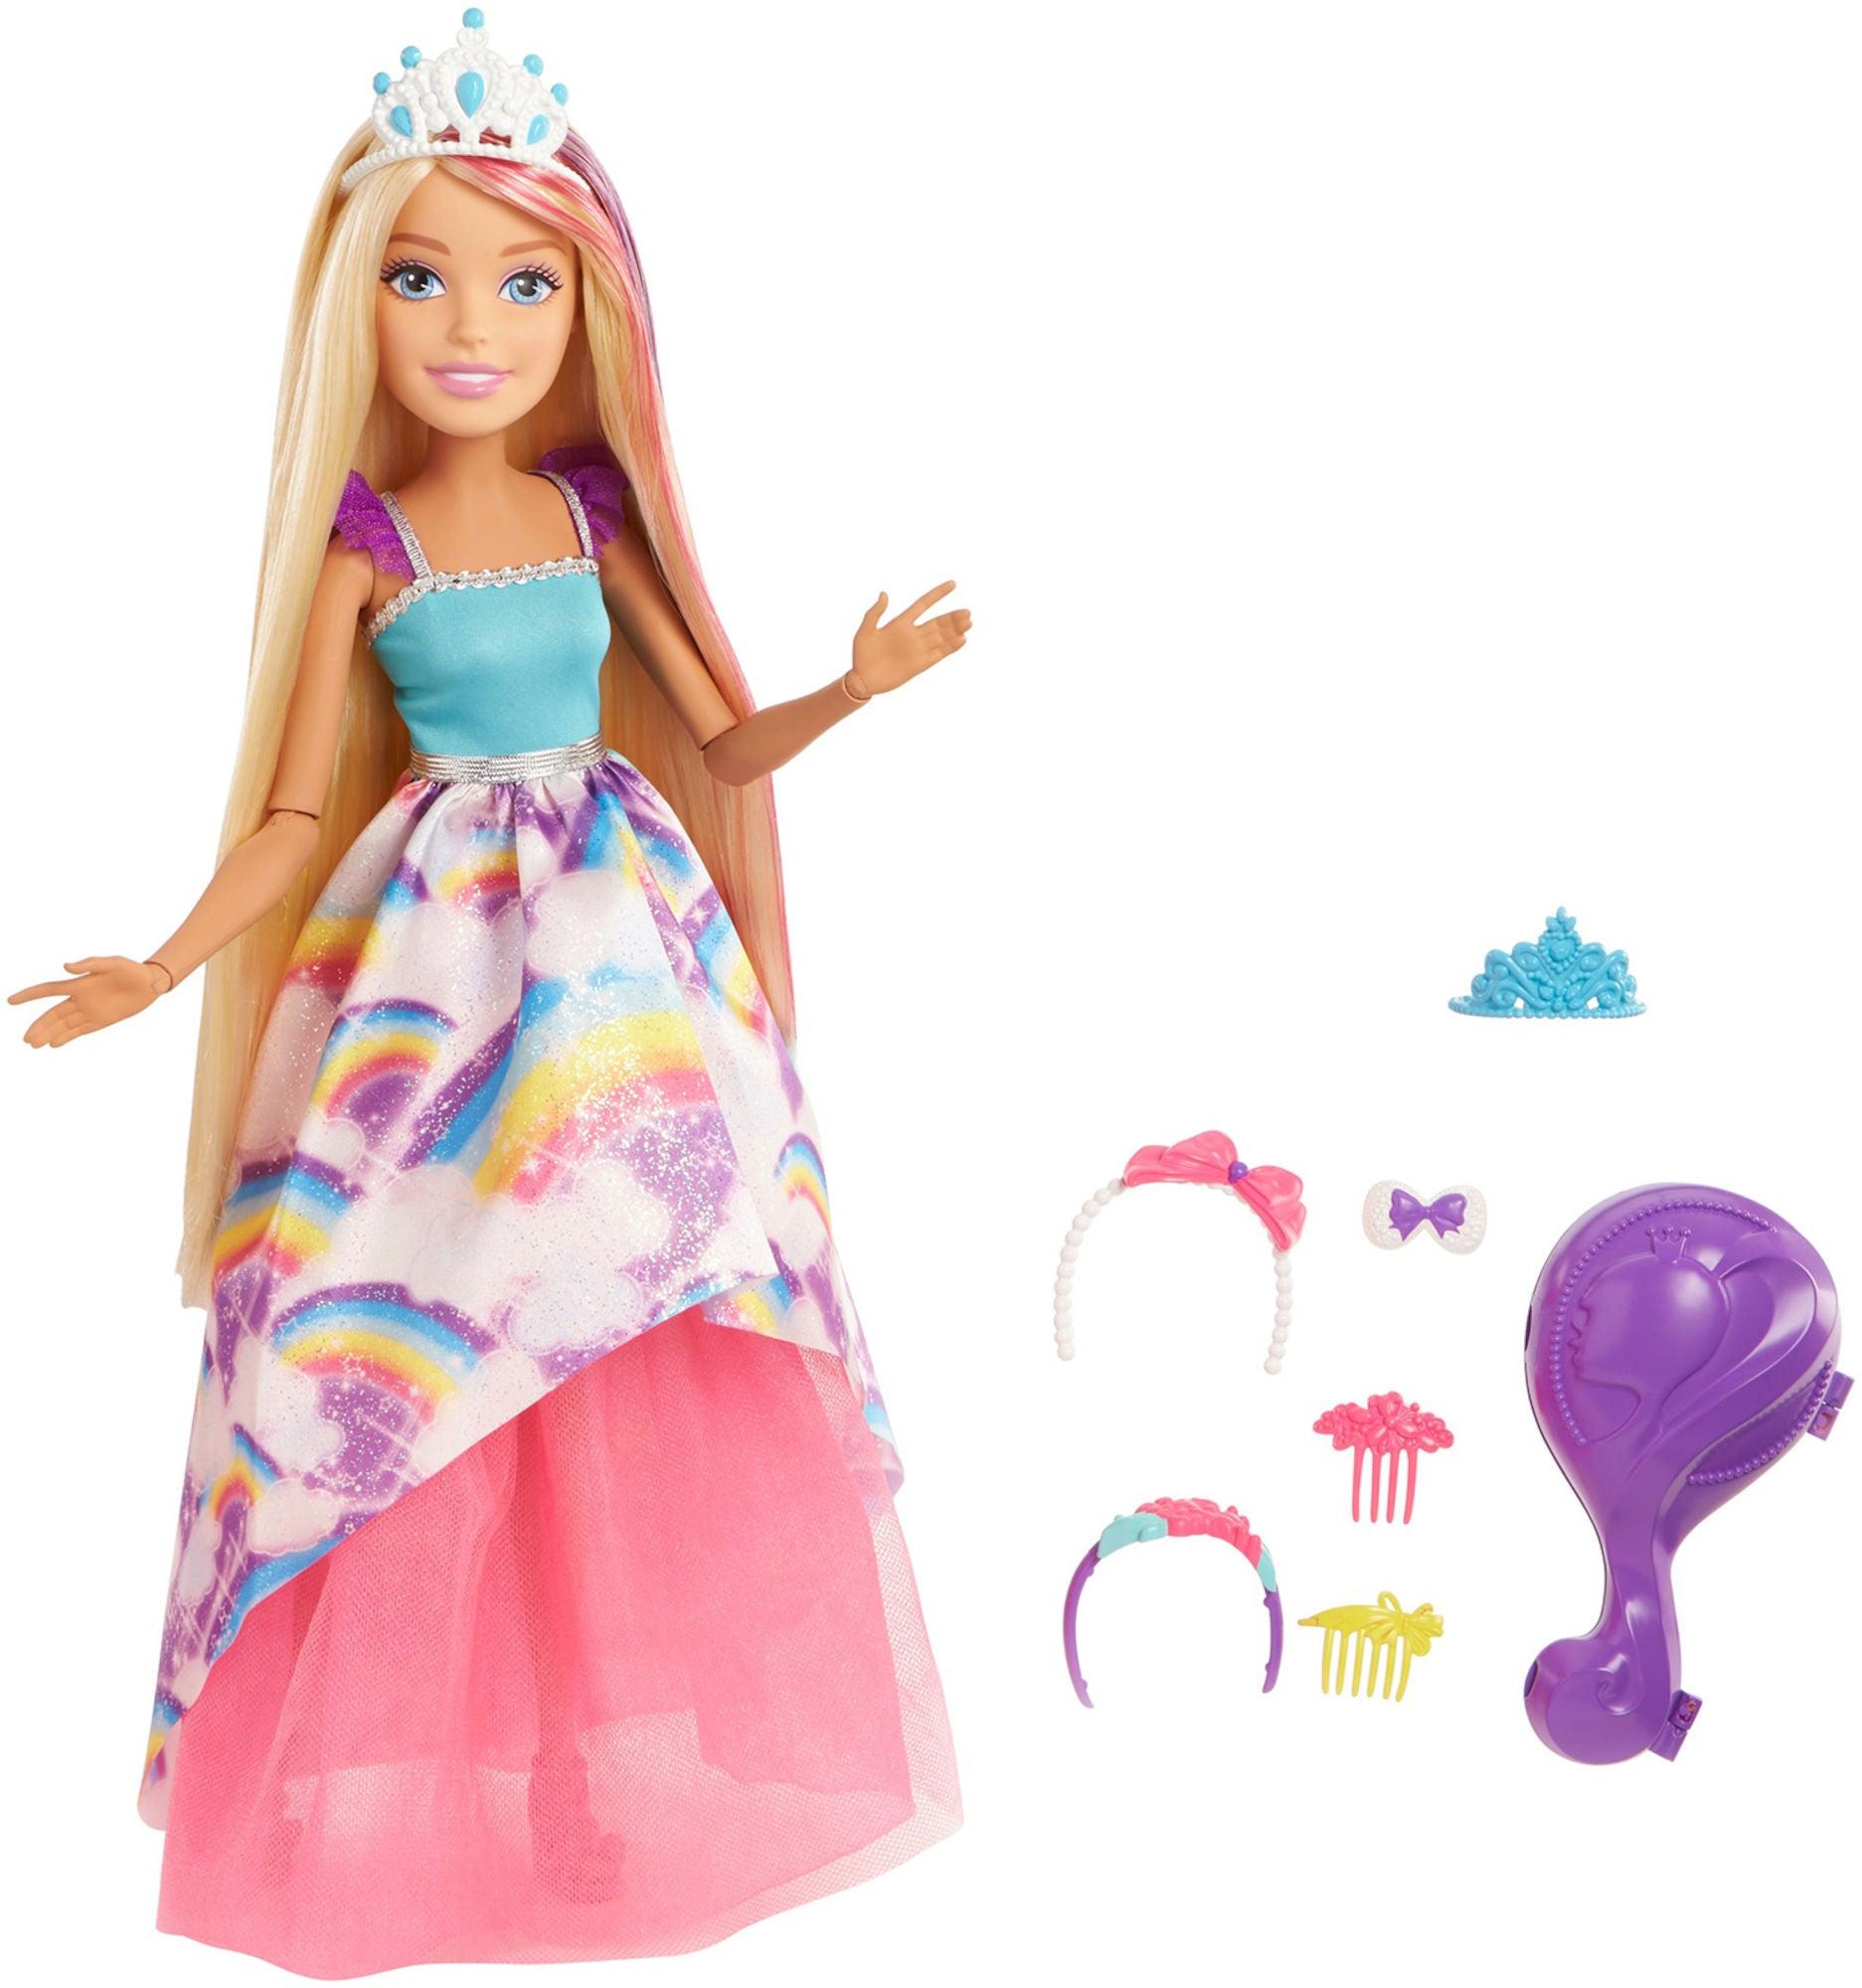 823a070c5 Köp Barbie Dreamtopia Docka 43 cm | Jollyroom